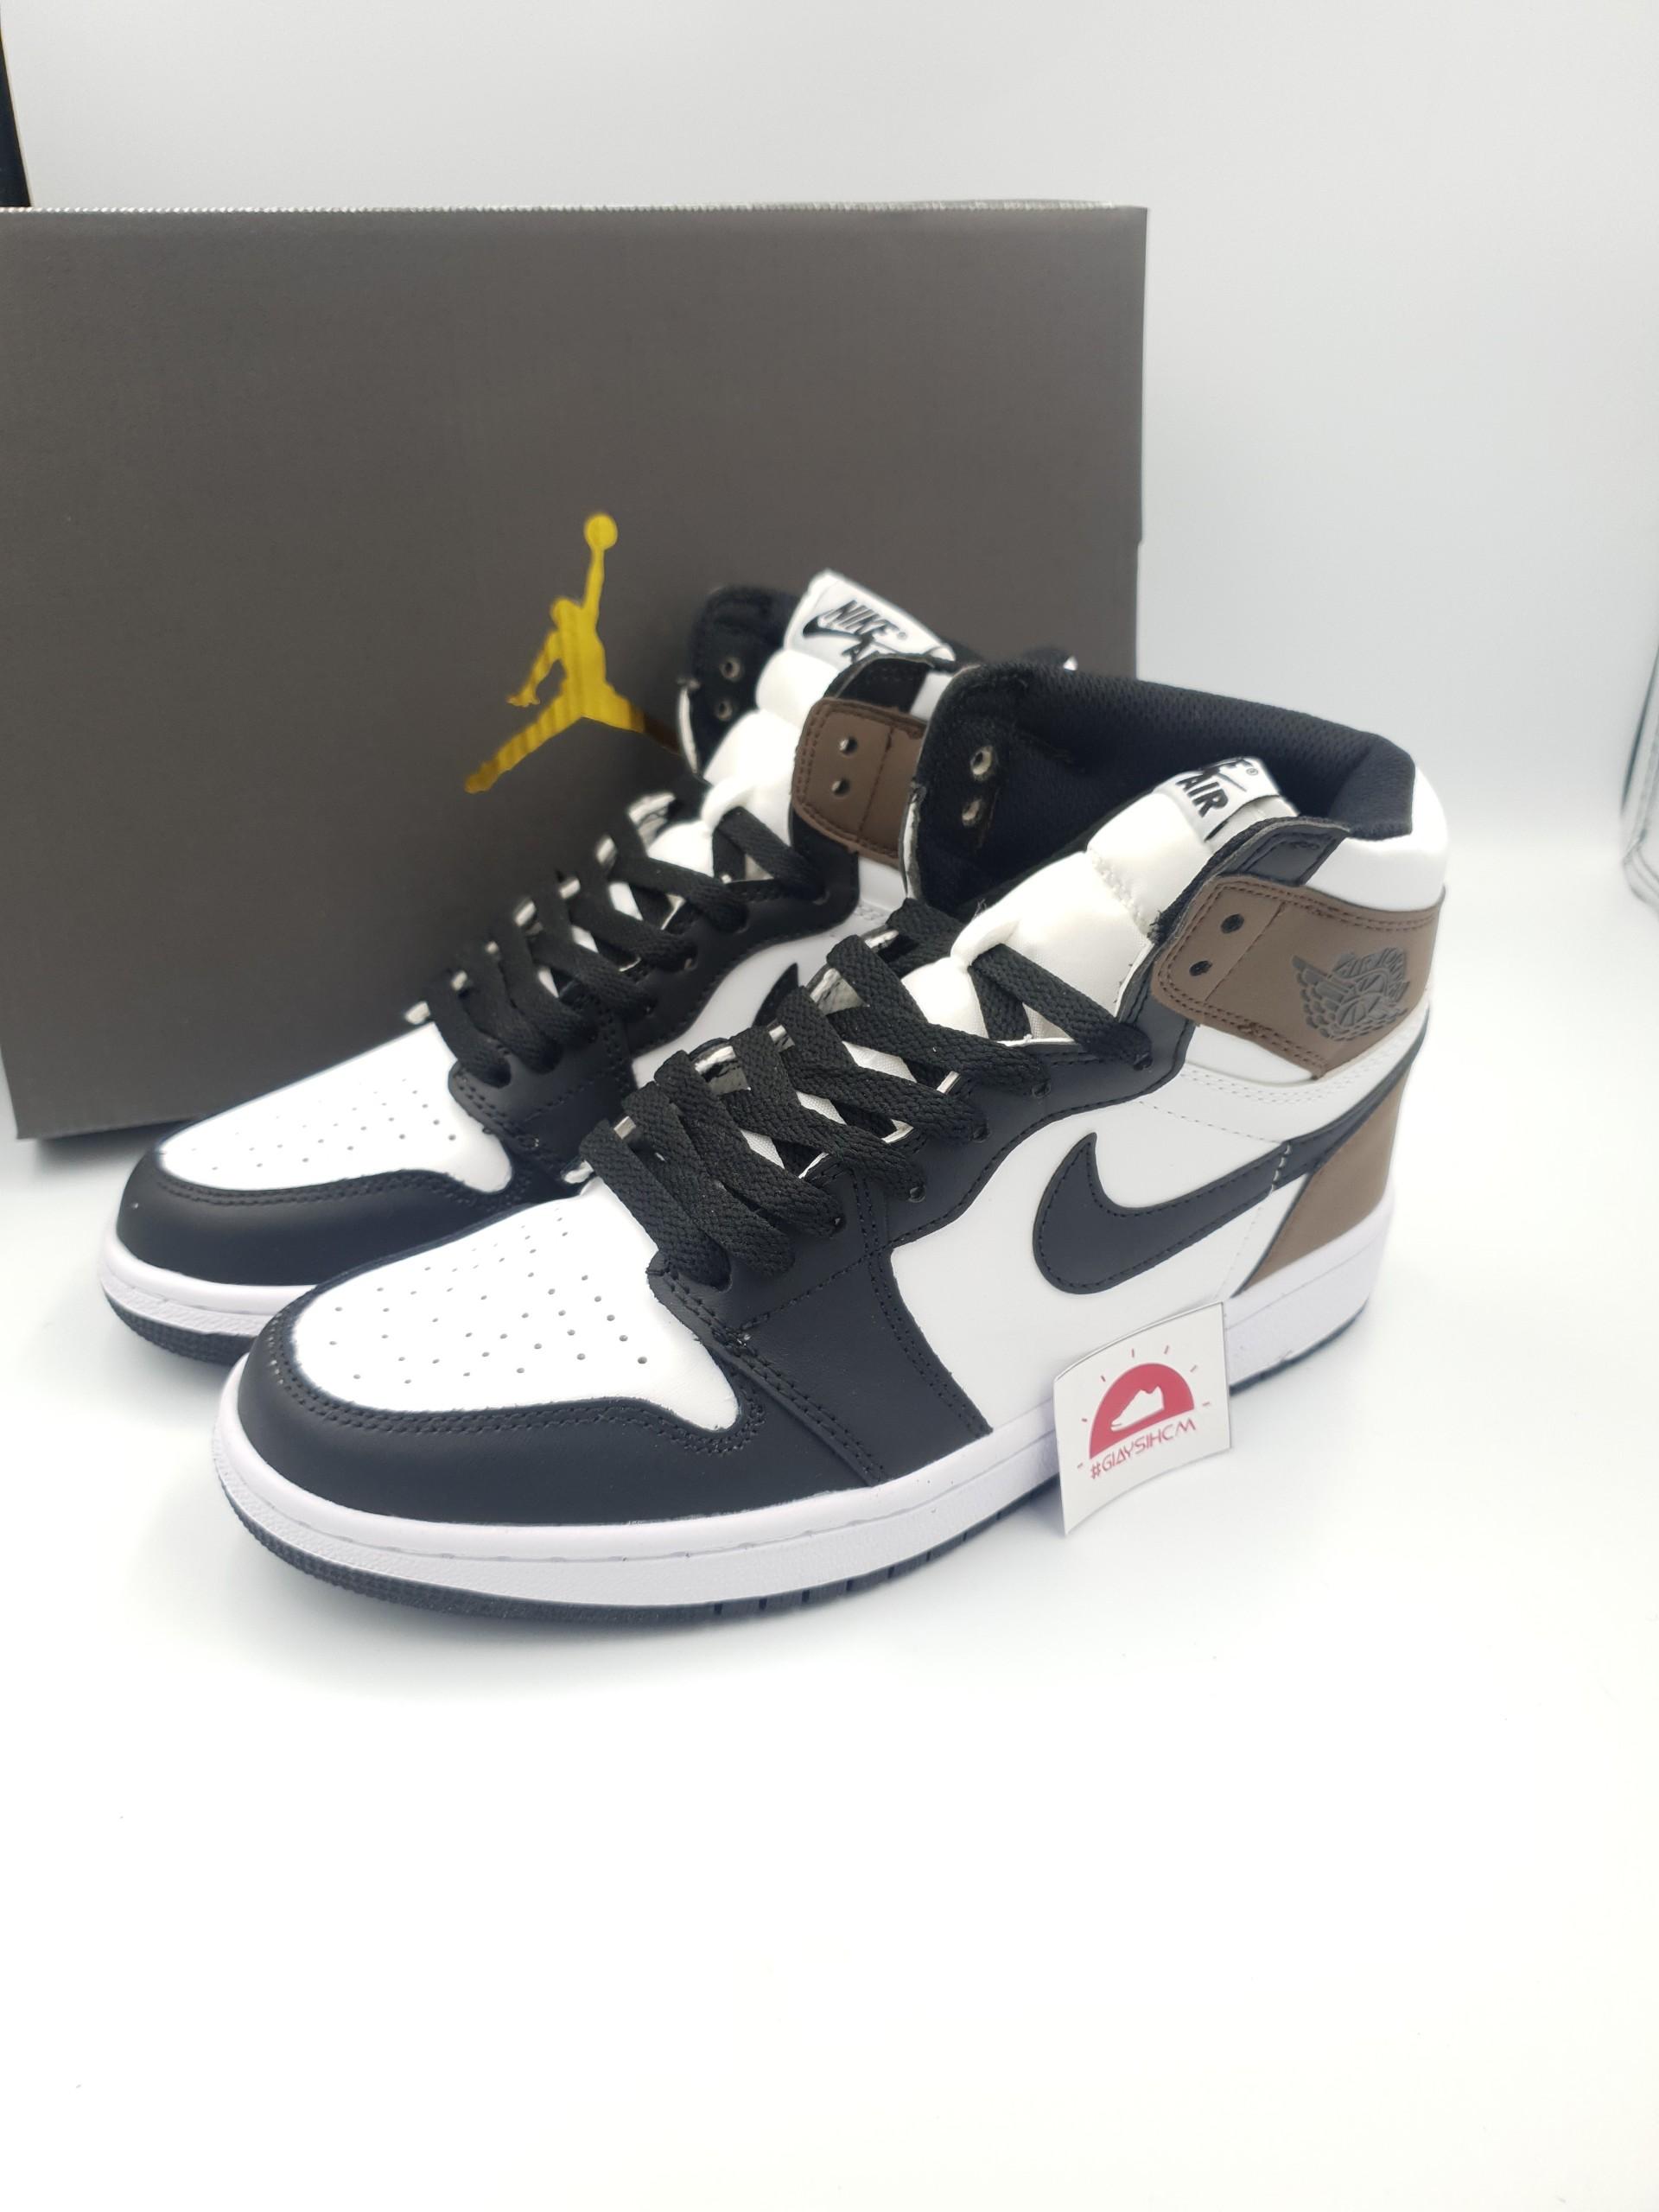 Jordan-1-Retro-High-Og-Dark-Mocha